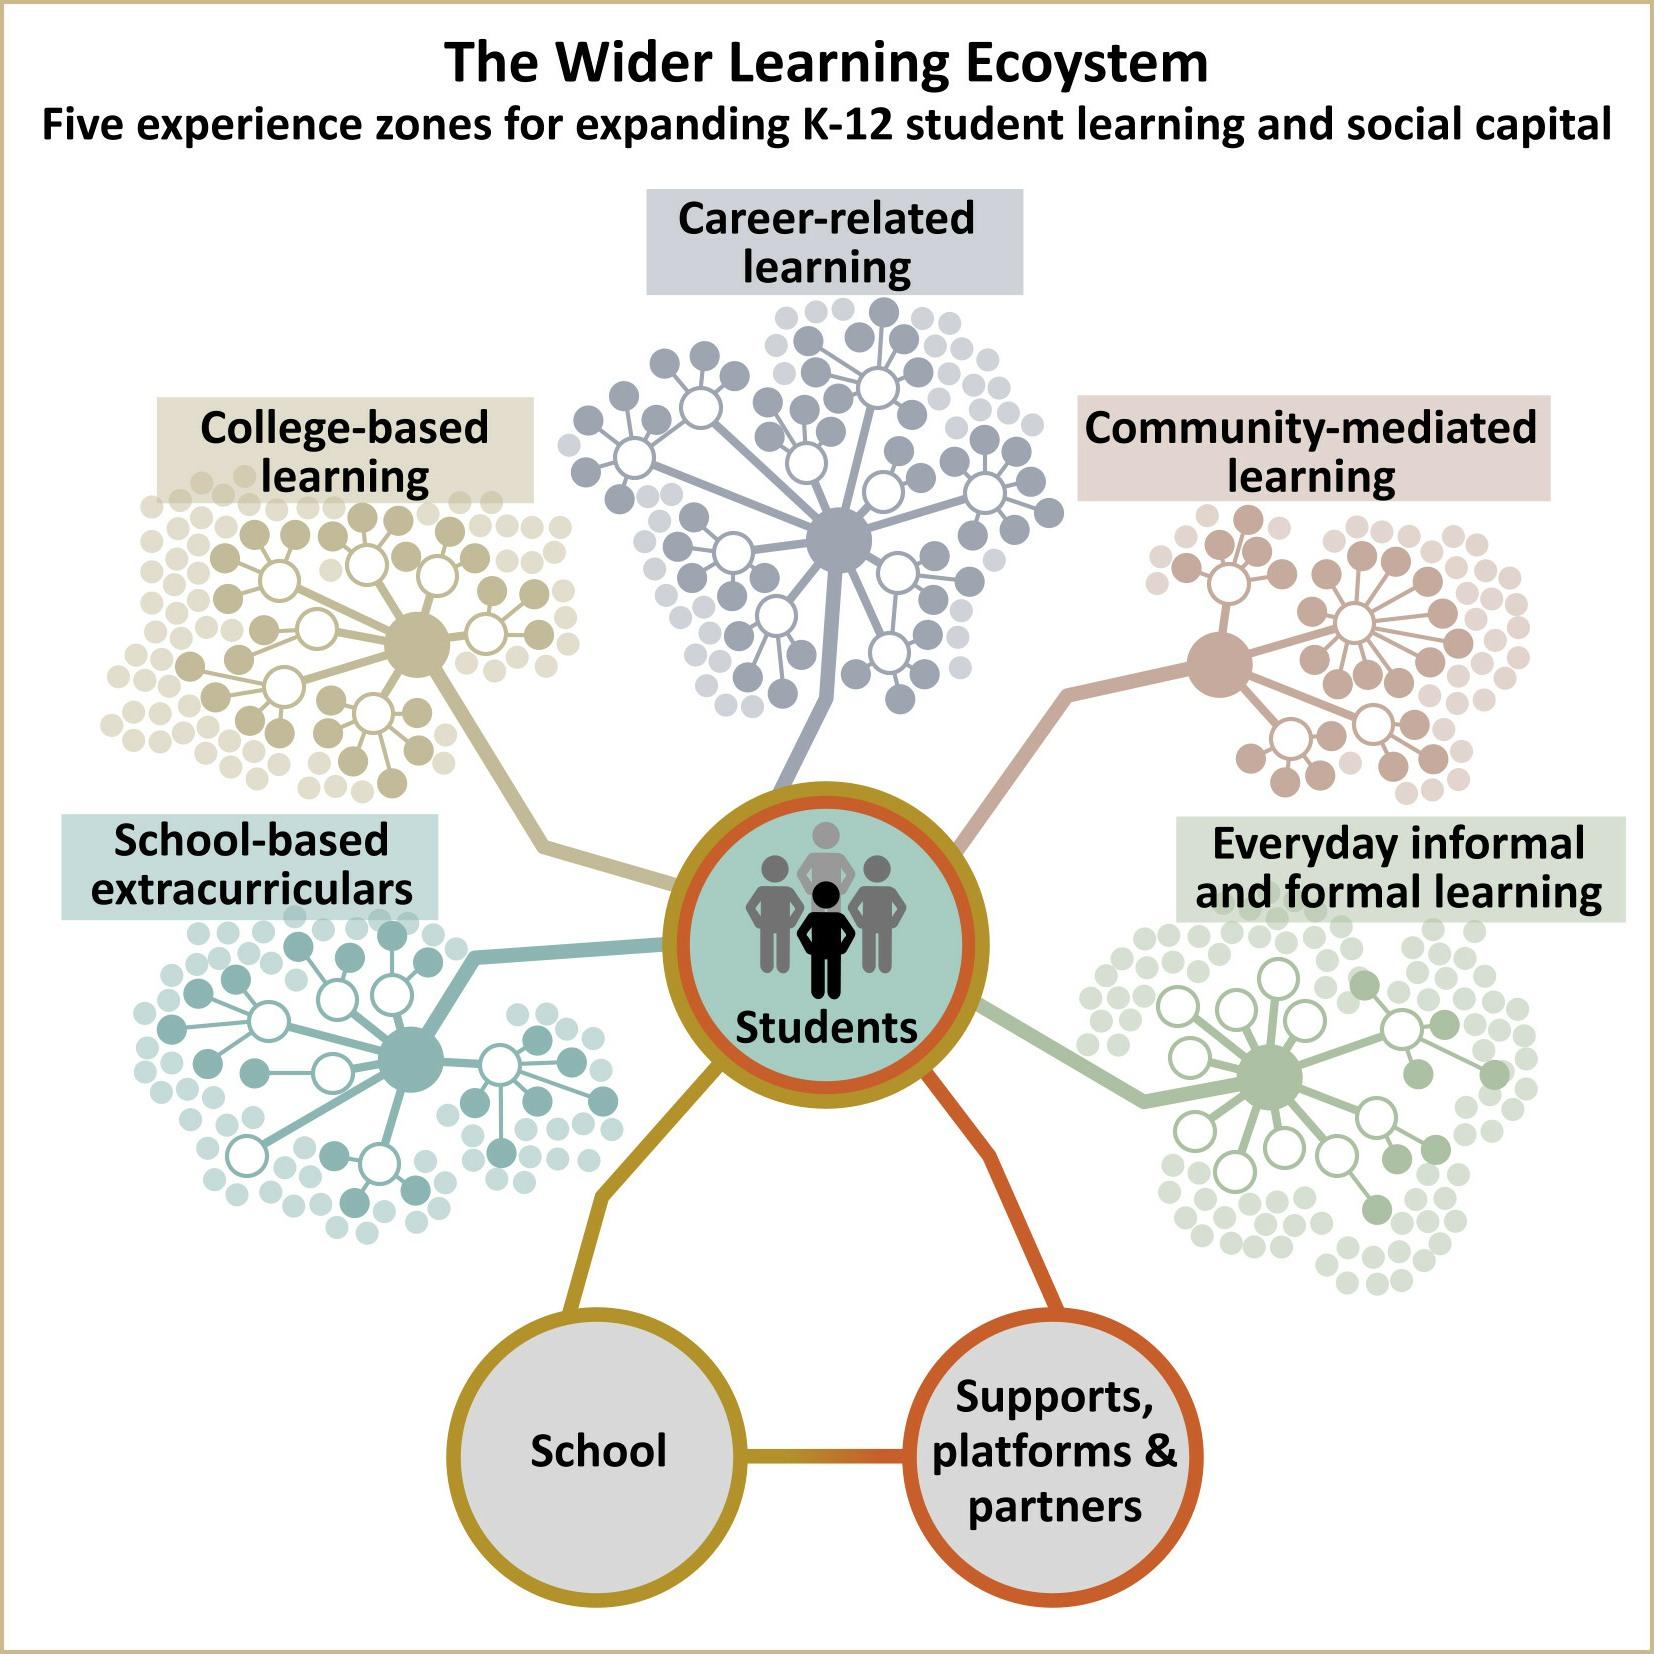 wider learning ecosystem 20171012v2-2.jpg